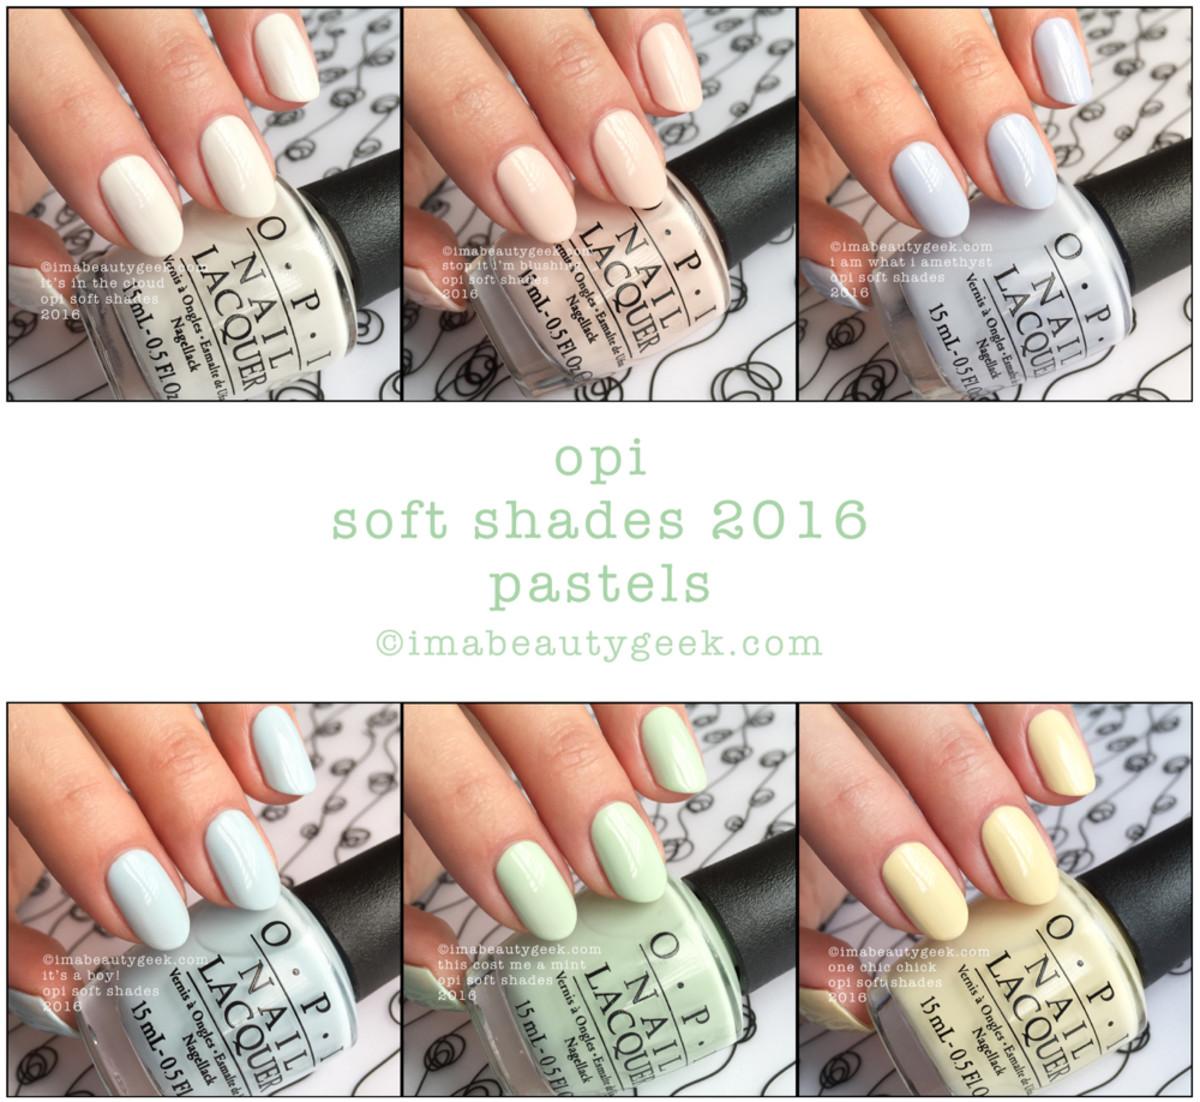 OPI Soft Shades 2016 Beautygeeks Composite - Version 2